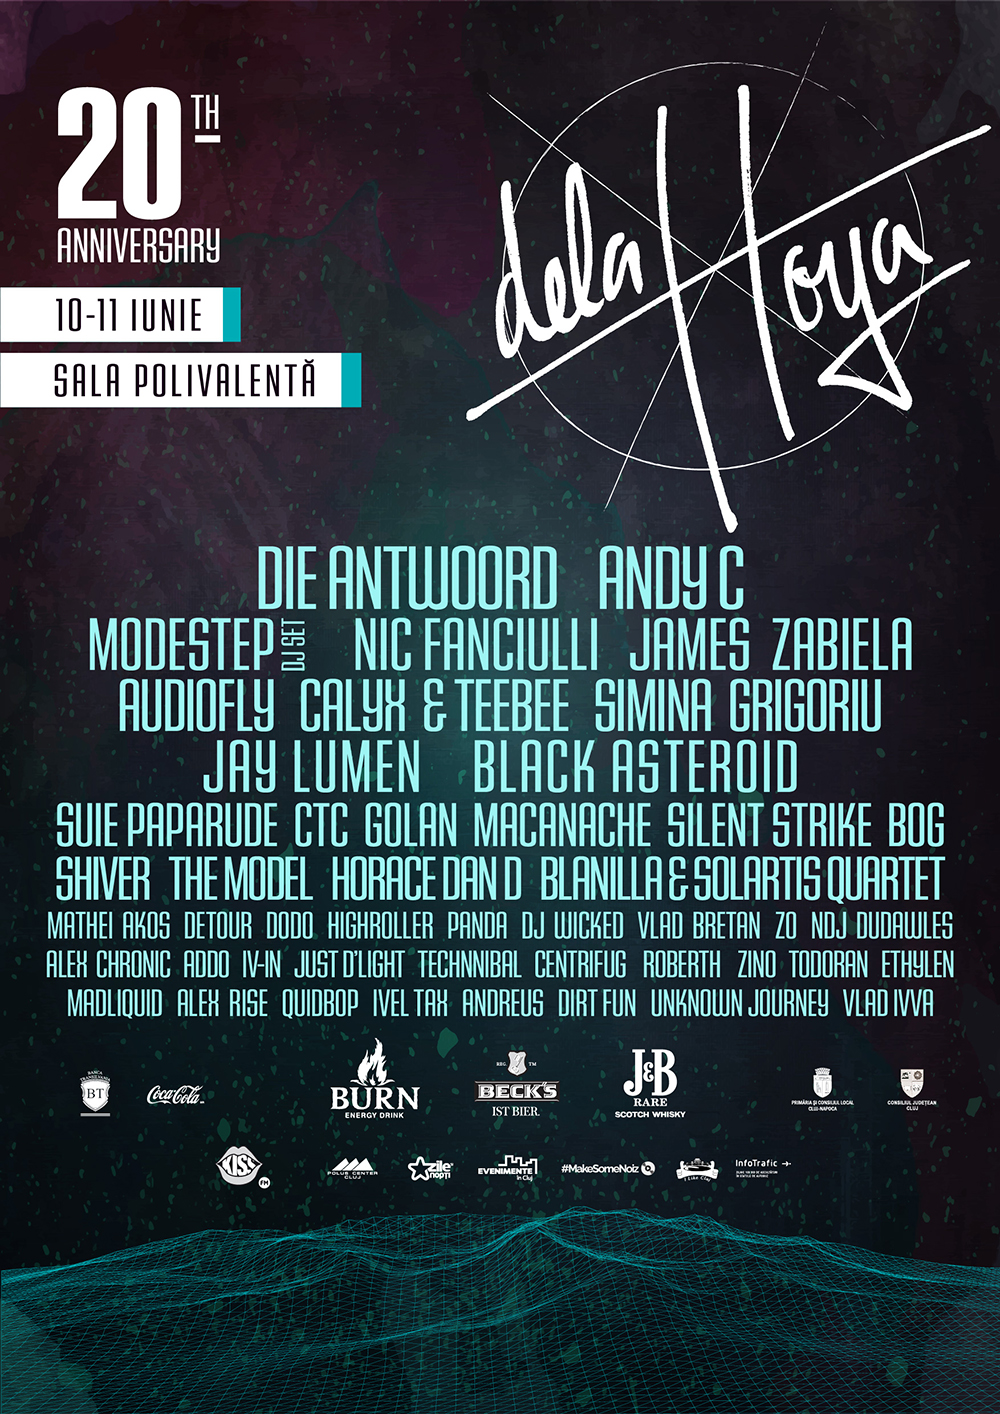 Delahoya 2016 - 20th Anniversary